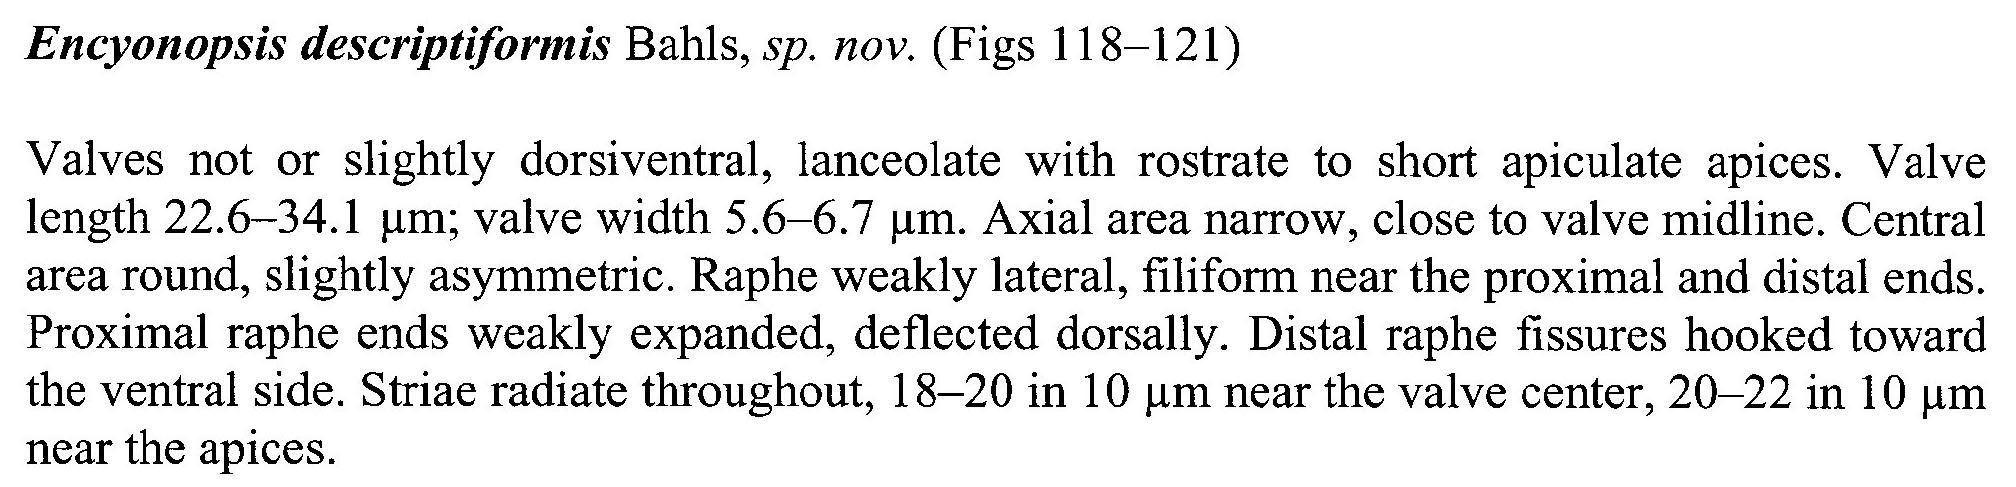 Encyo Descriptiformis Origdesc001